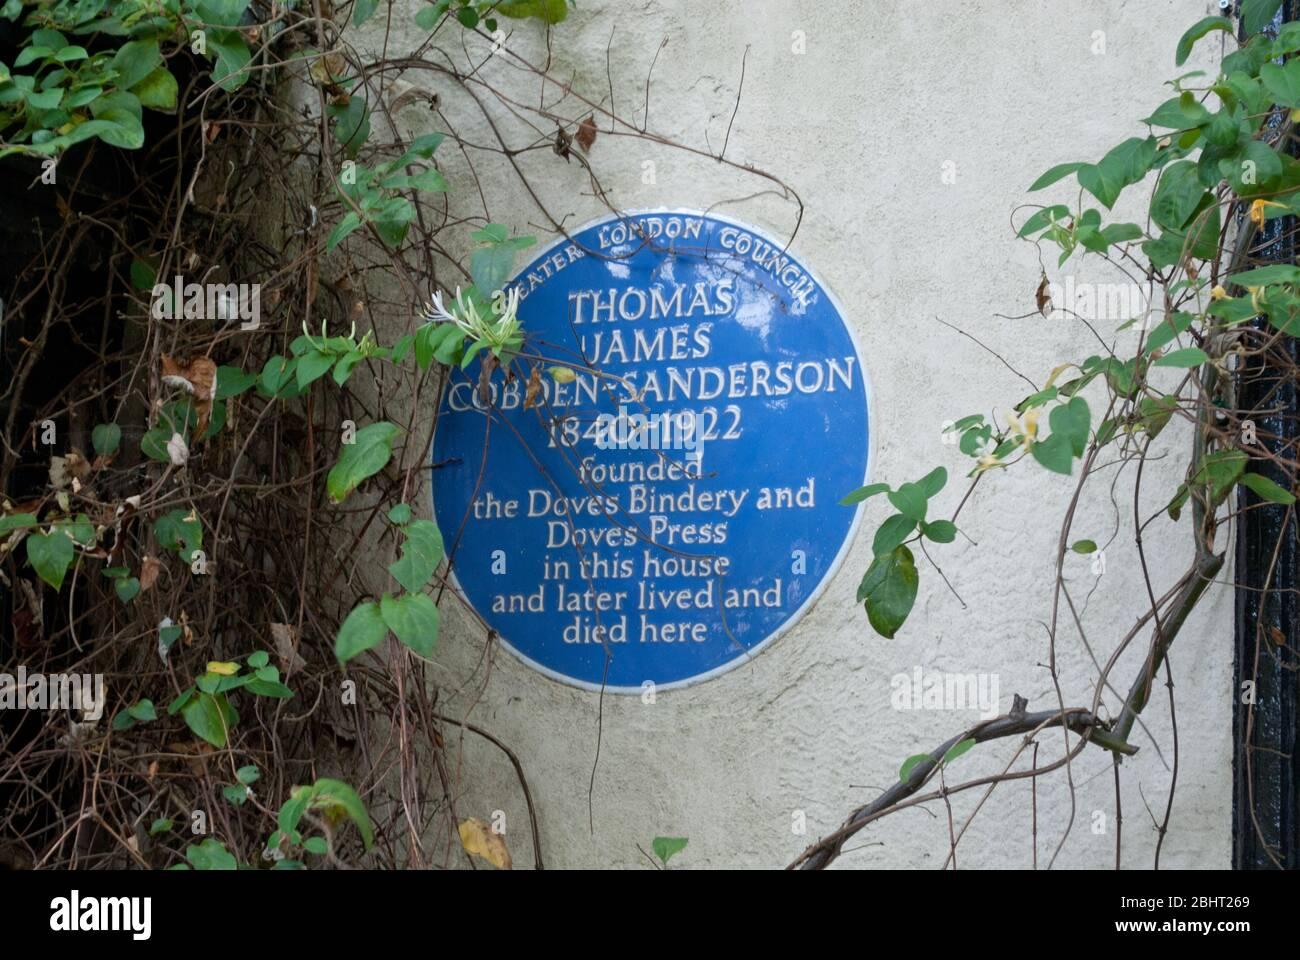 The Doves Press Bindery Emery Walker Kelmscott Press Arts & Crafts plaque commémorative en pierre Hammersmith Terrace, Hammersmith, Londres W4 2PF Banque D'Images